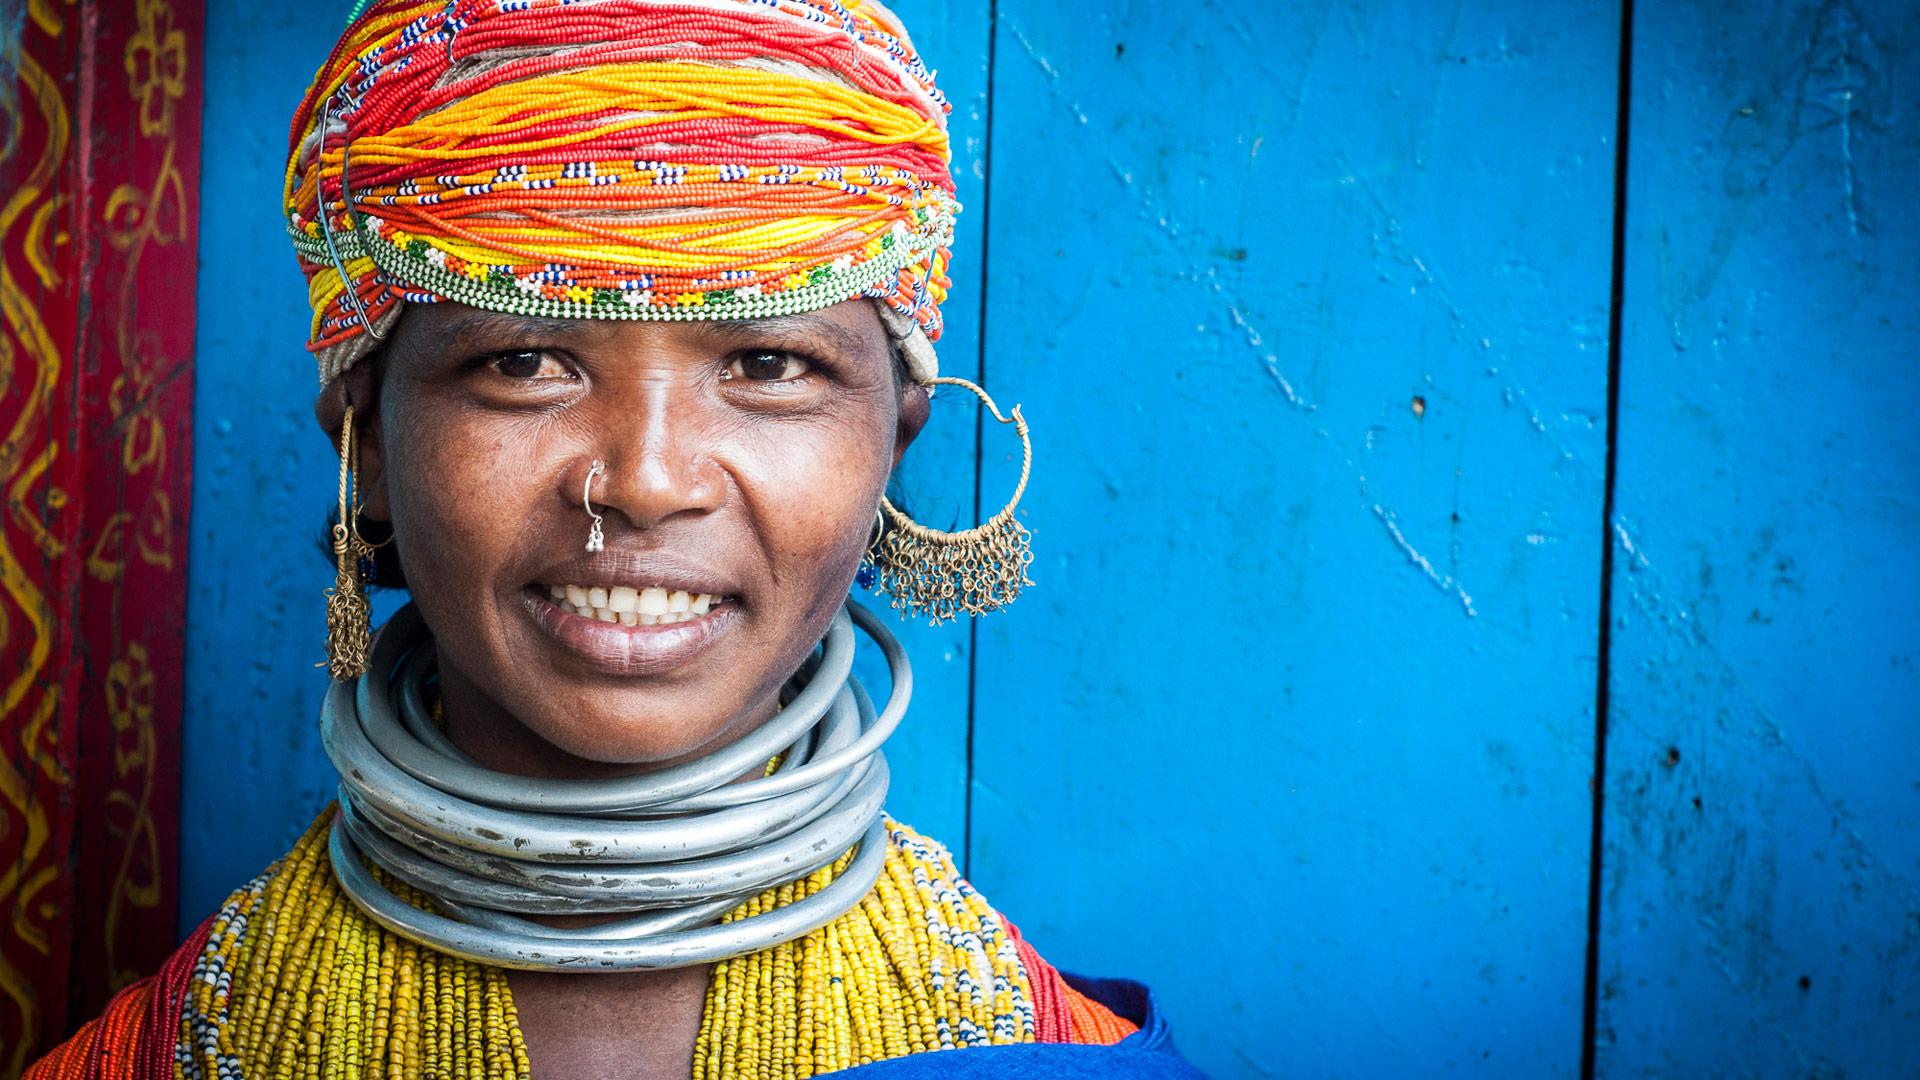 Tribeswoman in Odisha, India with GeoEx